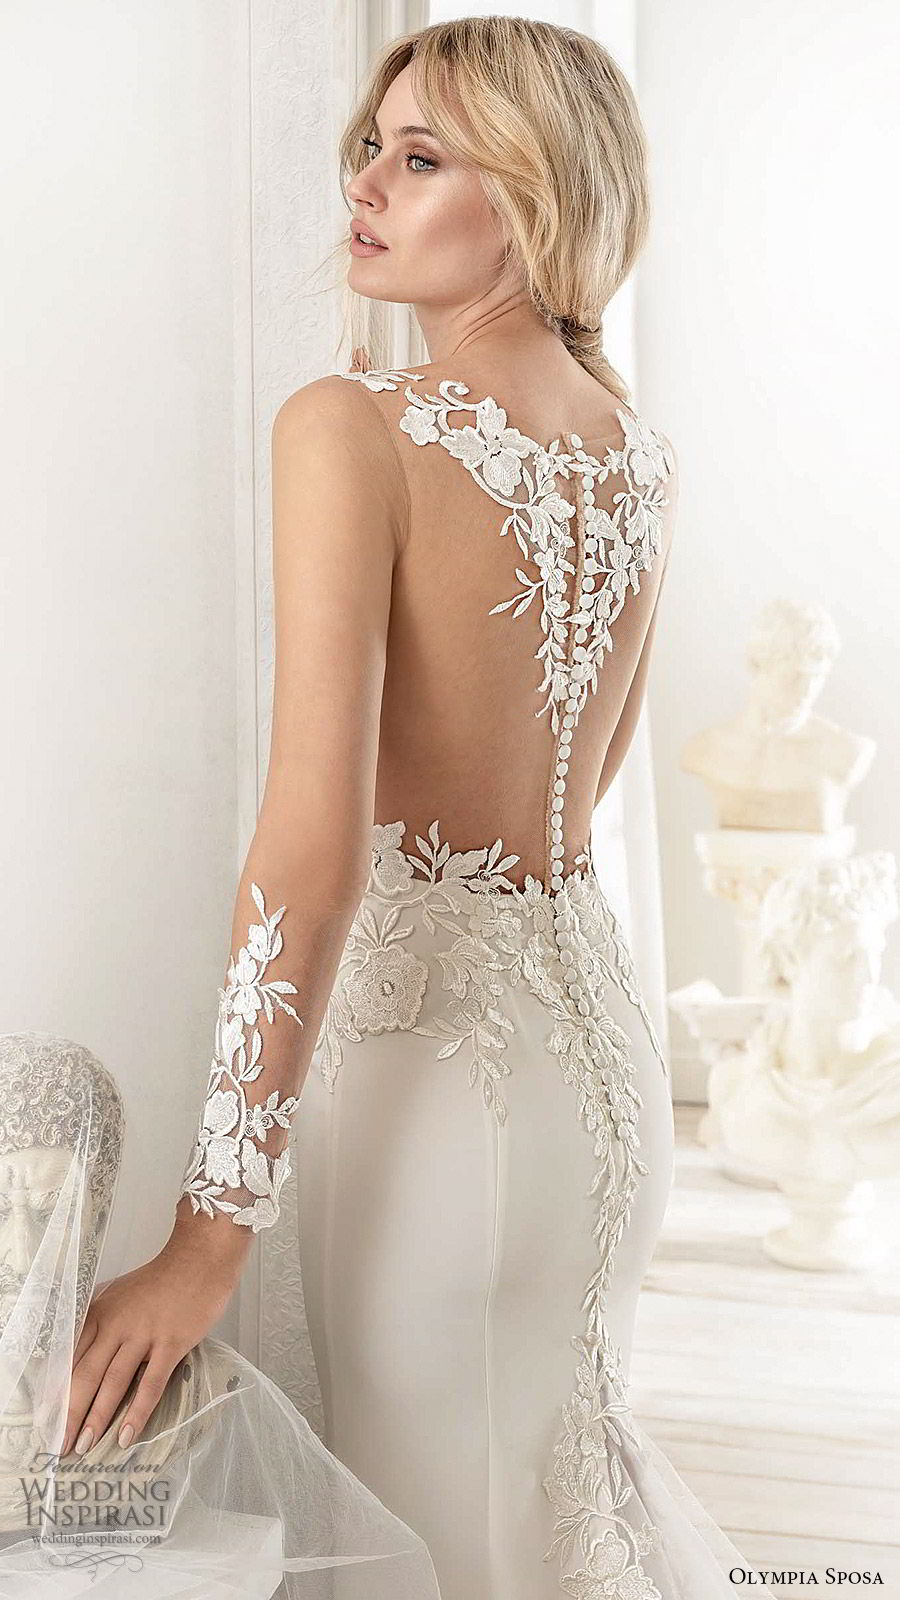 olympia sposa 2020 bridal illusion long sleeves v neckline sheer embellished bodice fit flare trumpet mermaid wedding dress (15) elegant sexy illusion back chapel train zbv